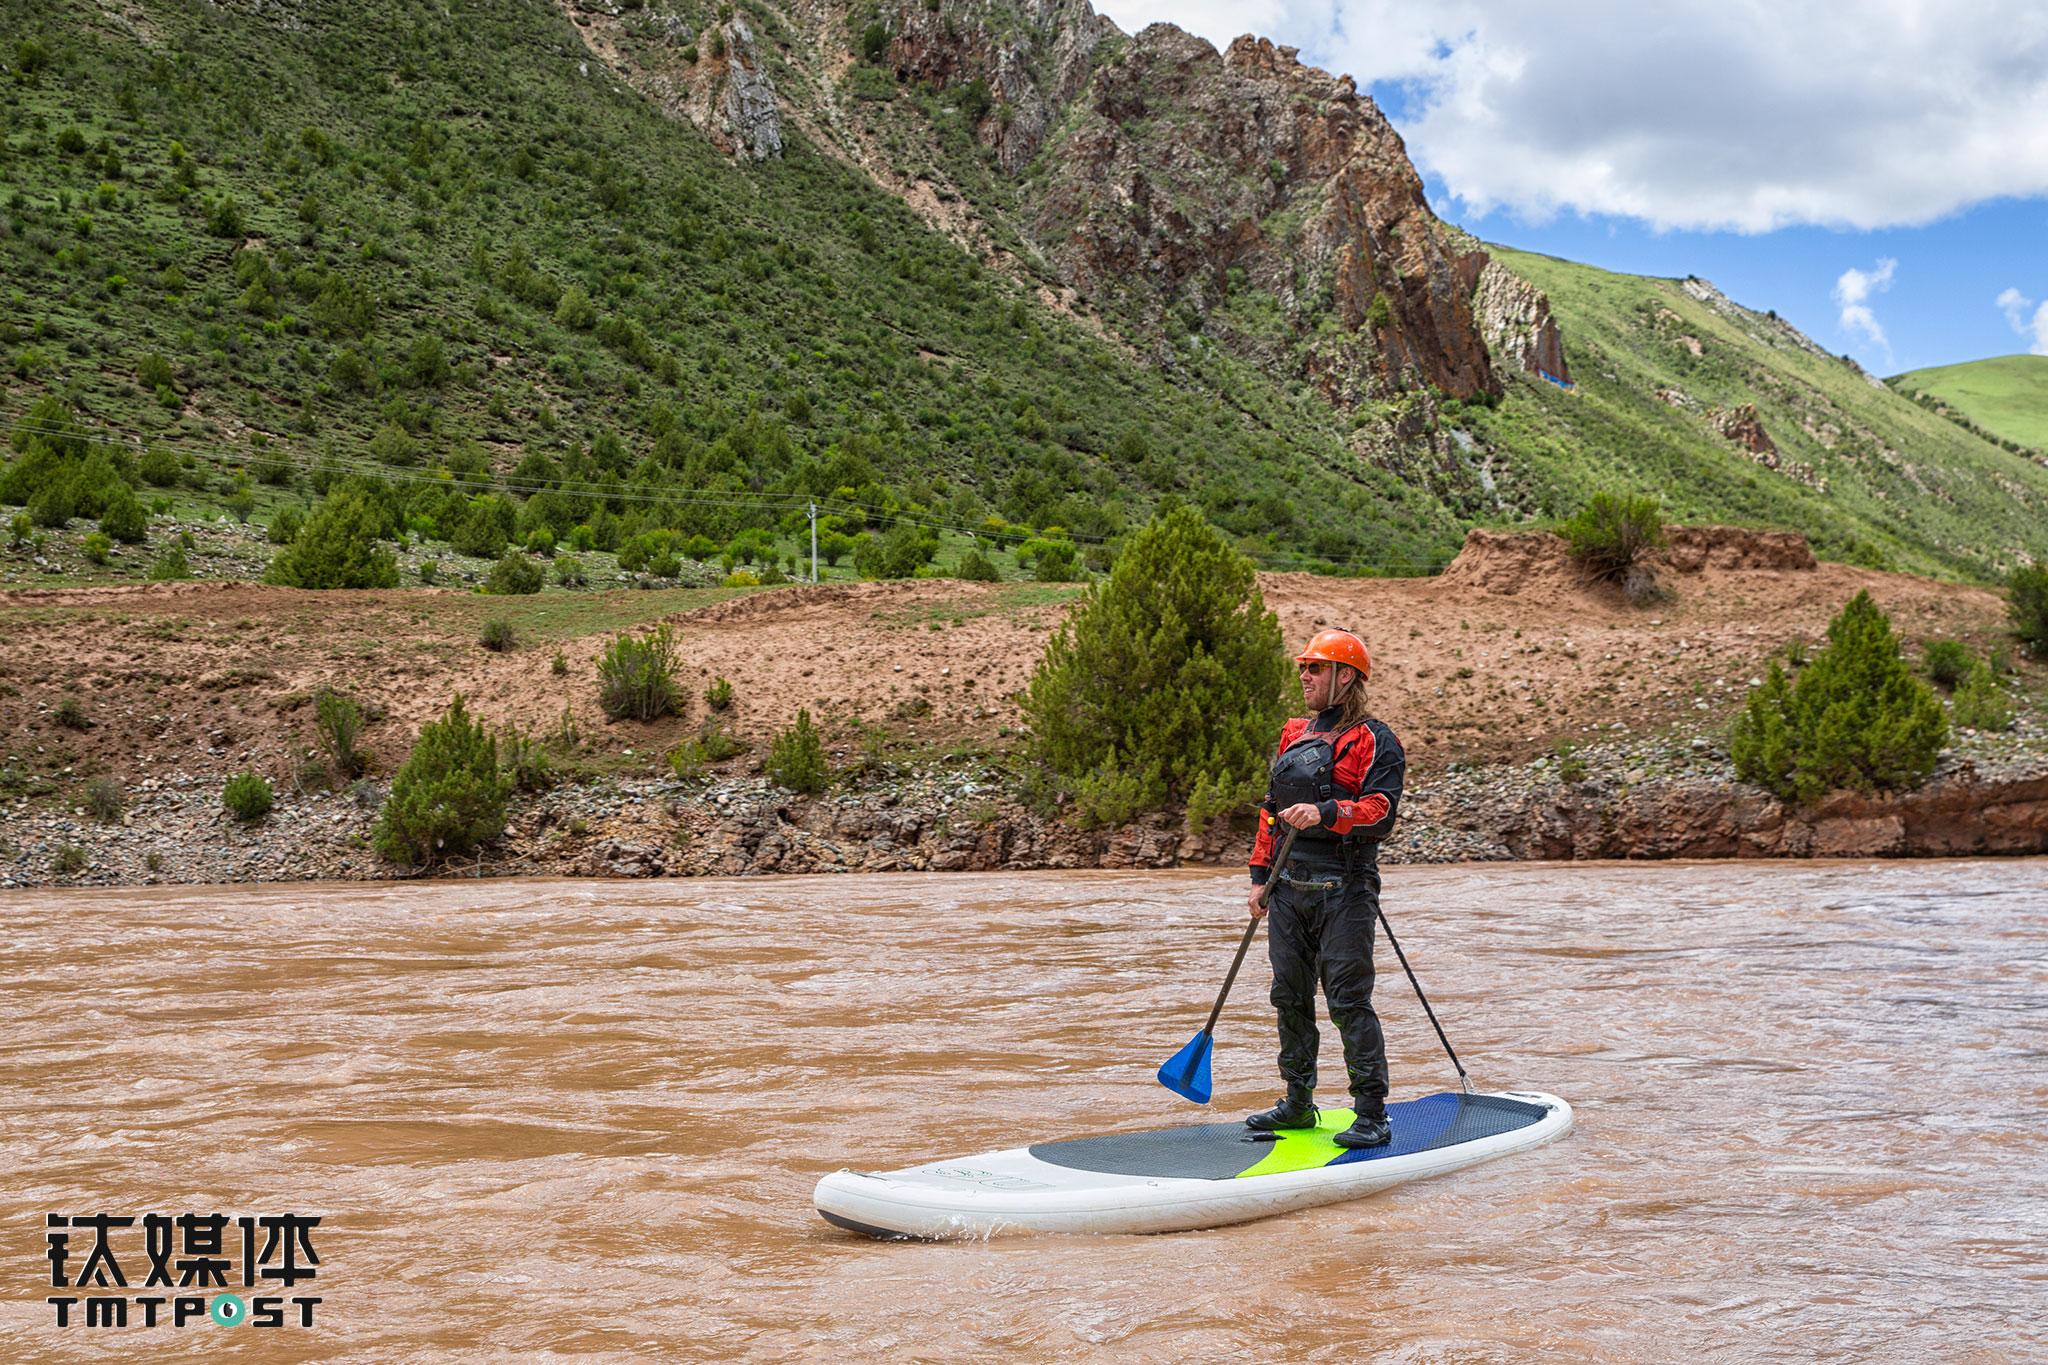 Jonah是科罗拉多大峡谷的一名资深船长,也是户外摄影师和纪录片作者。父母第一次将他带到河流上漂流,他才9个月大。这次漂流,他主要负责河流上的安全保障。